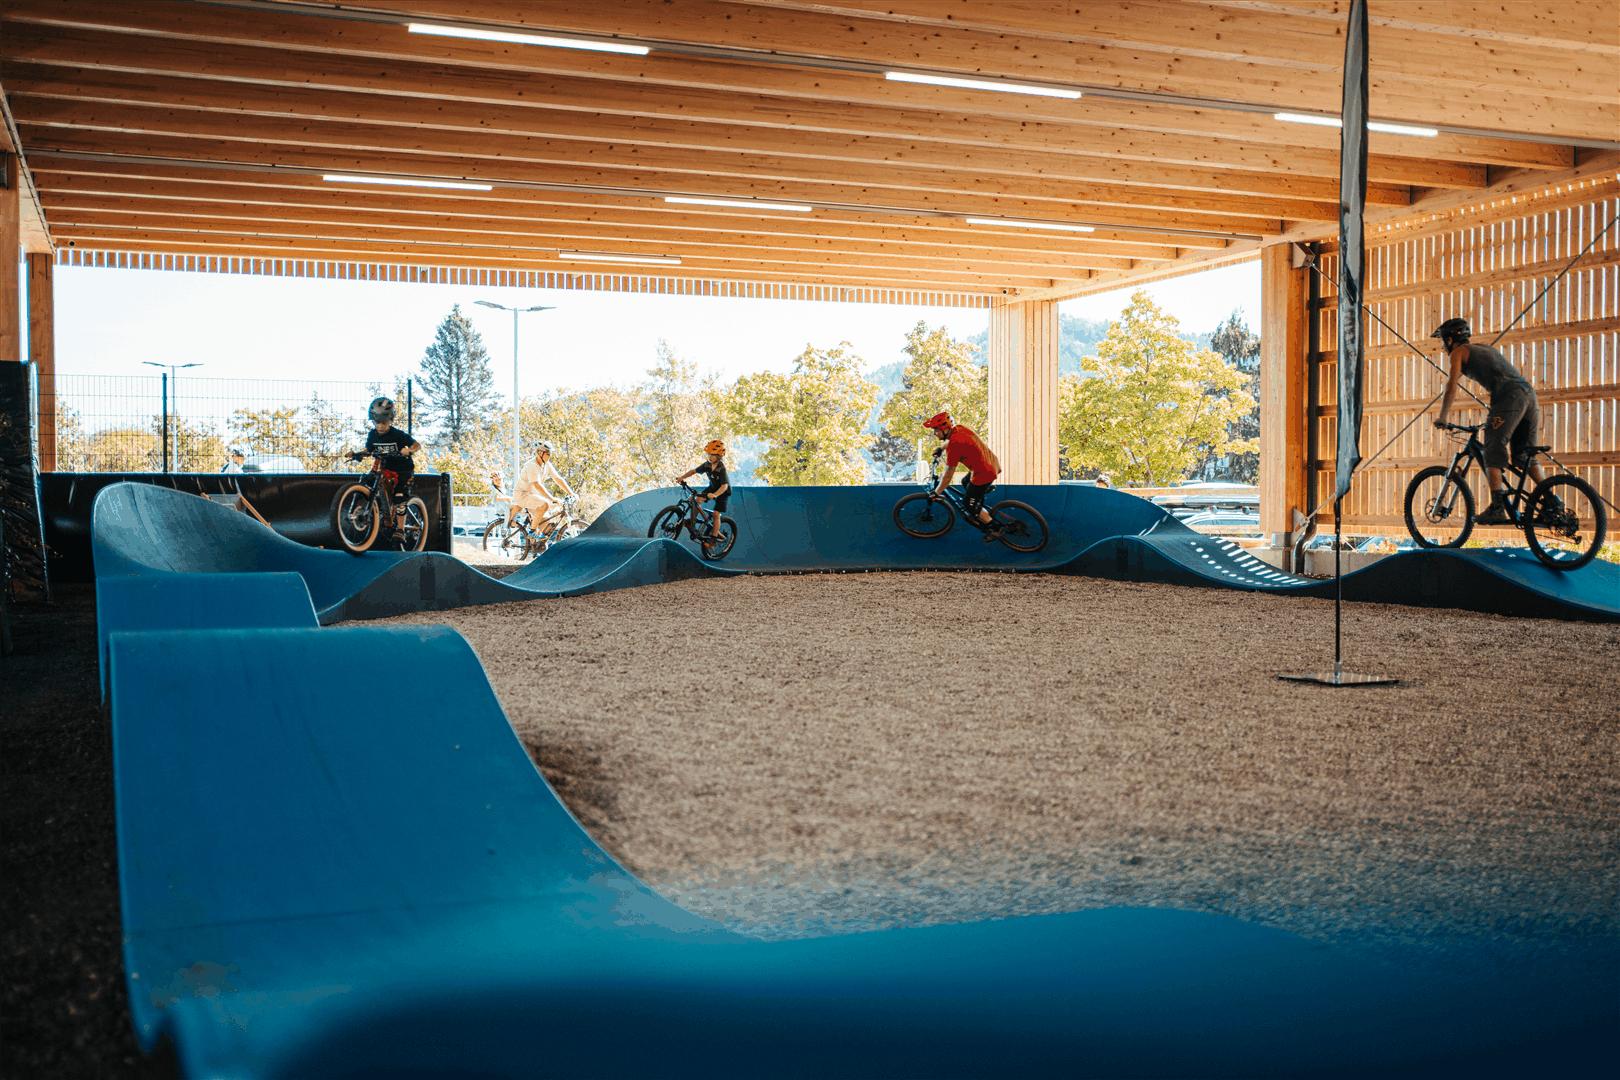 Aktivitäten Villach Faaker See Ausflugsziel Pumptrack Biken Kärnten